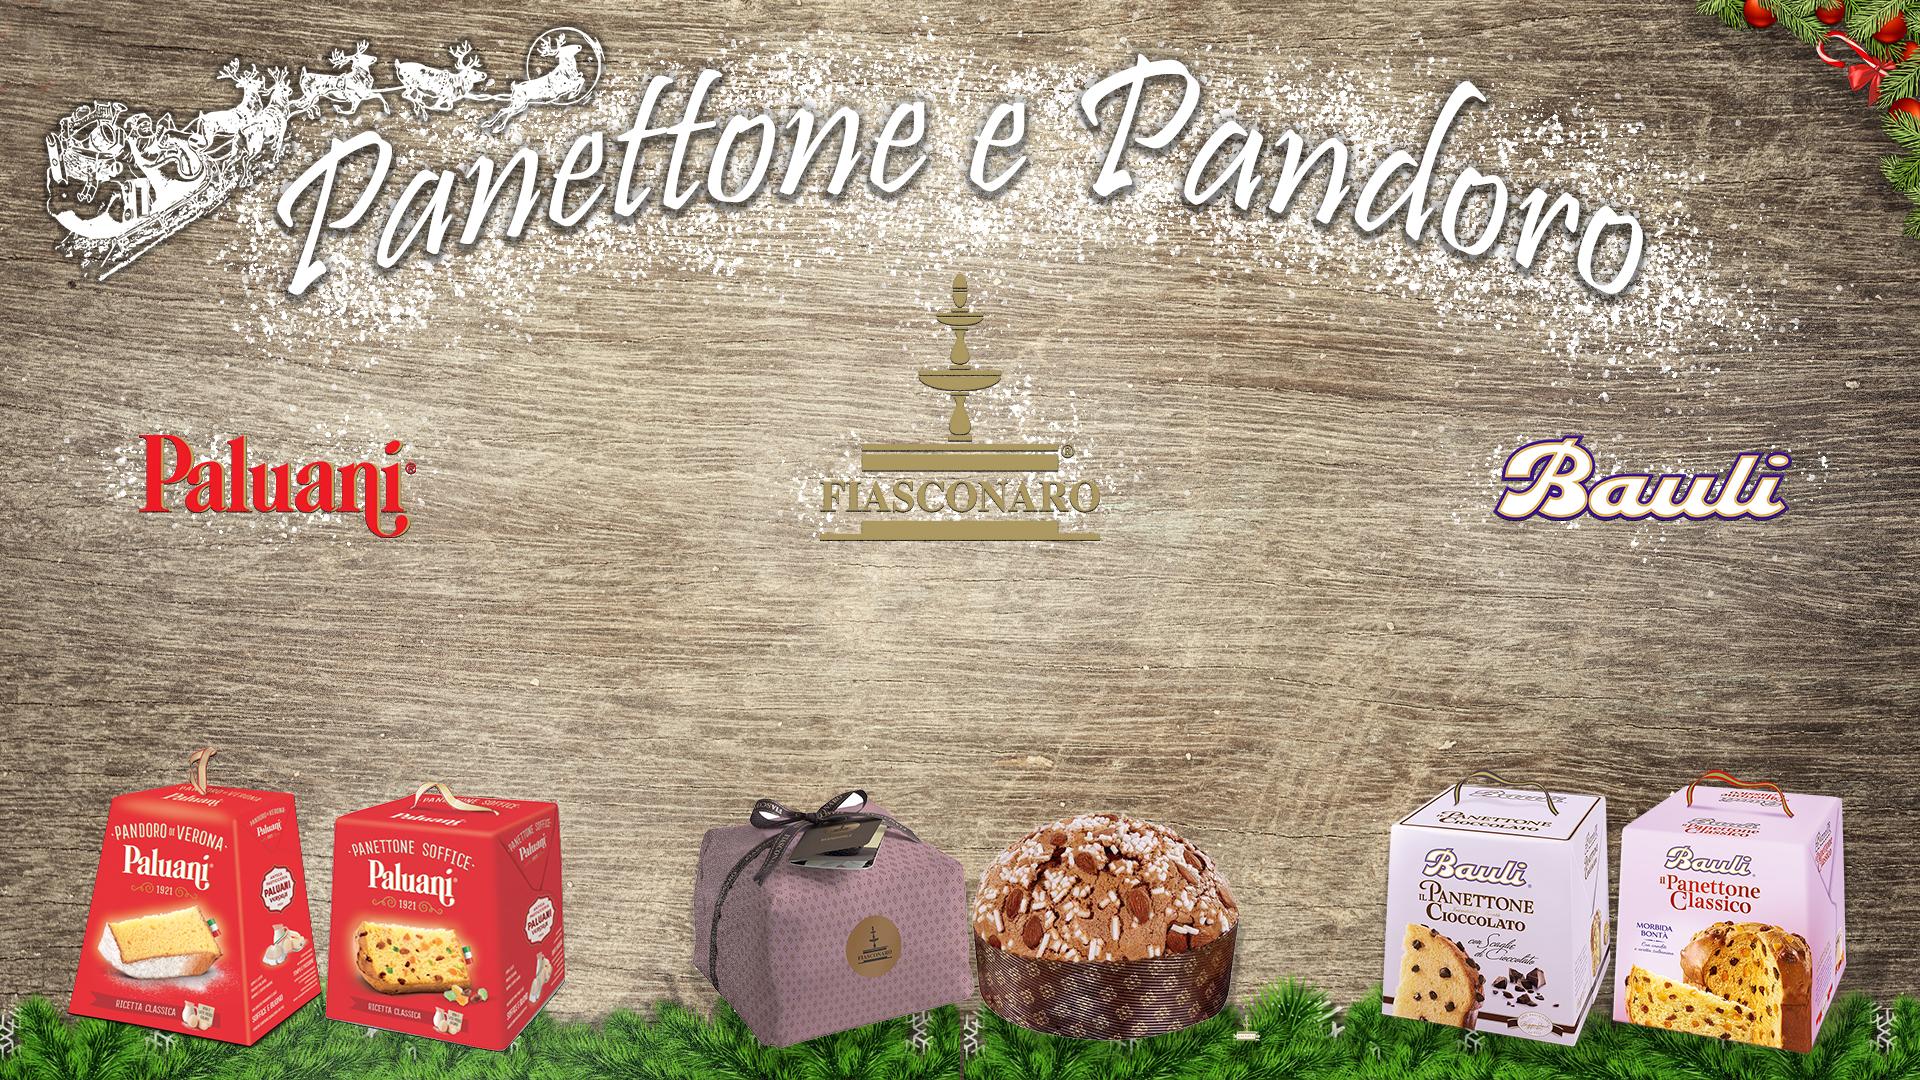 Panettone-Werbung-ShopfNdqFMg3yxQwF